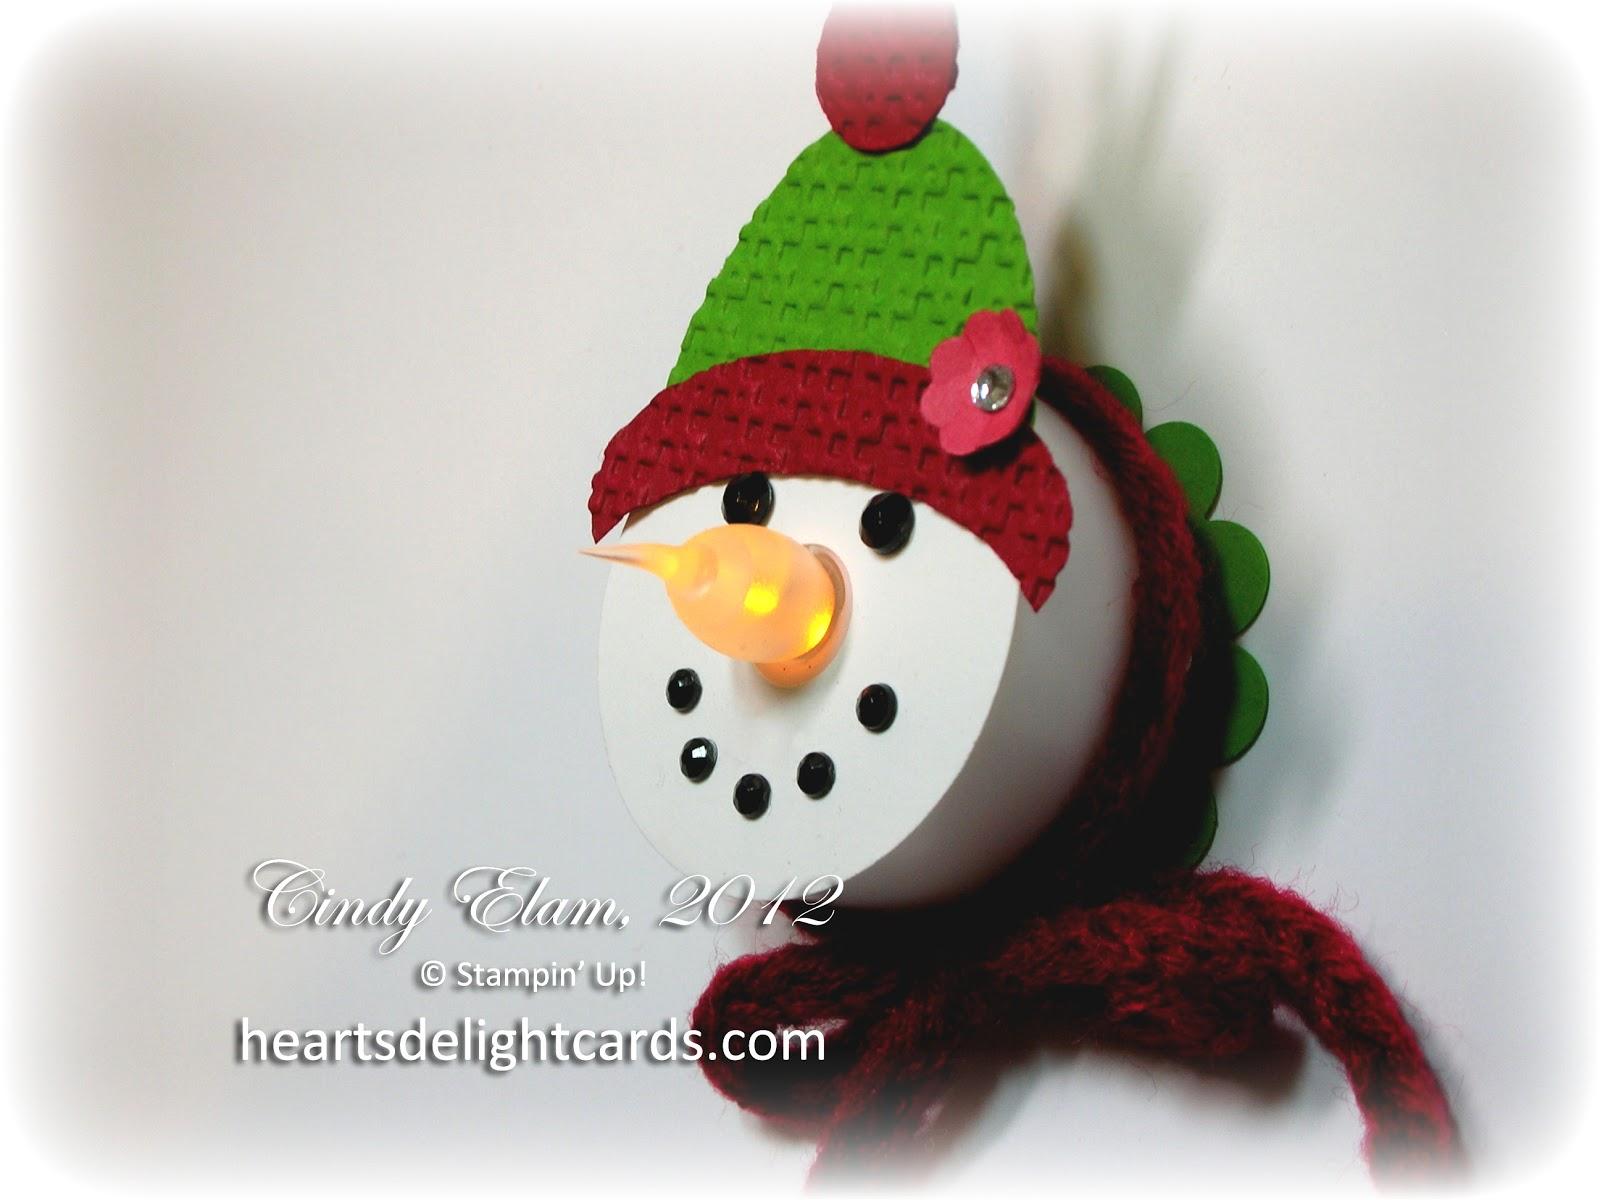 Heart S Delight Cards Snowman Tea Light Ornament